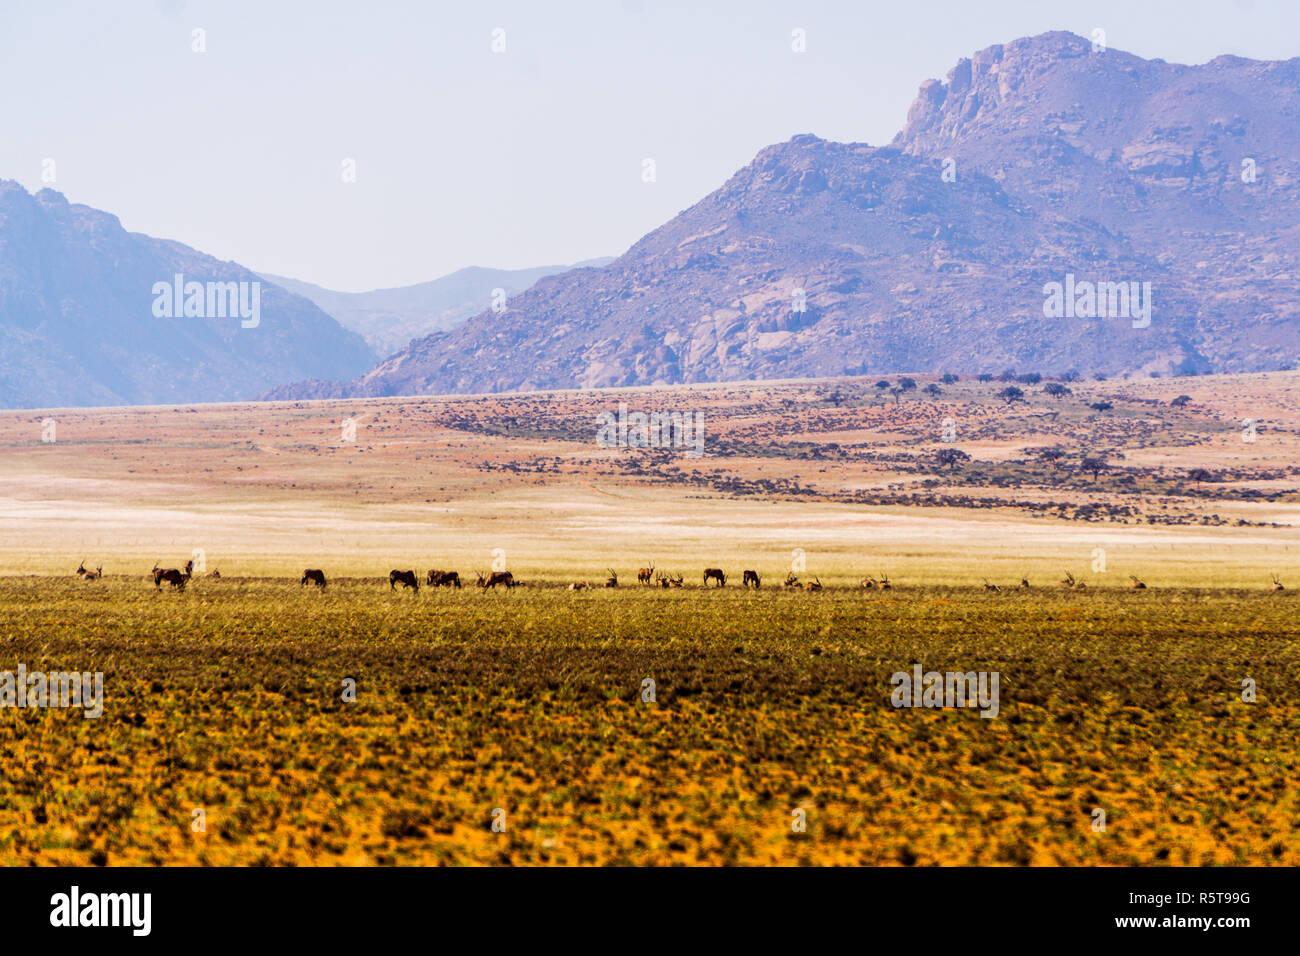 namibia desert mountains d707 sky - Stock Image